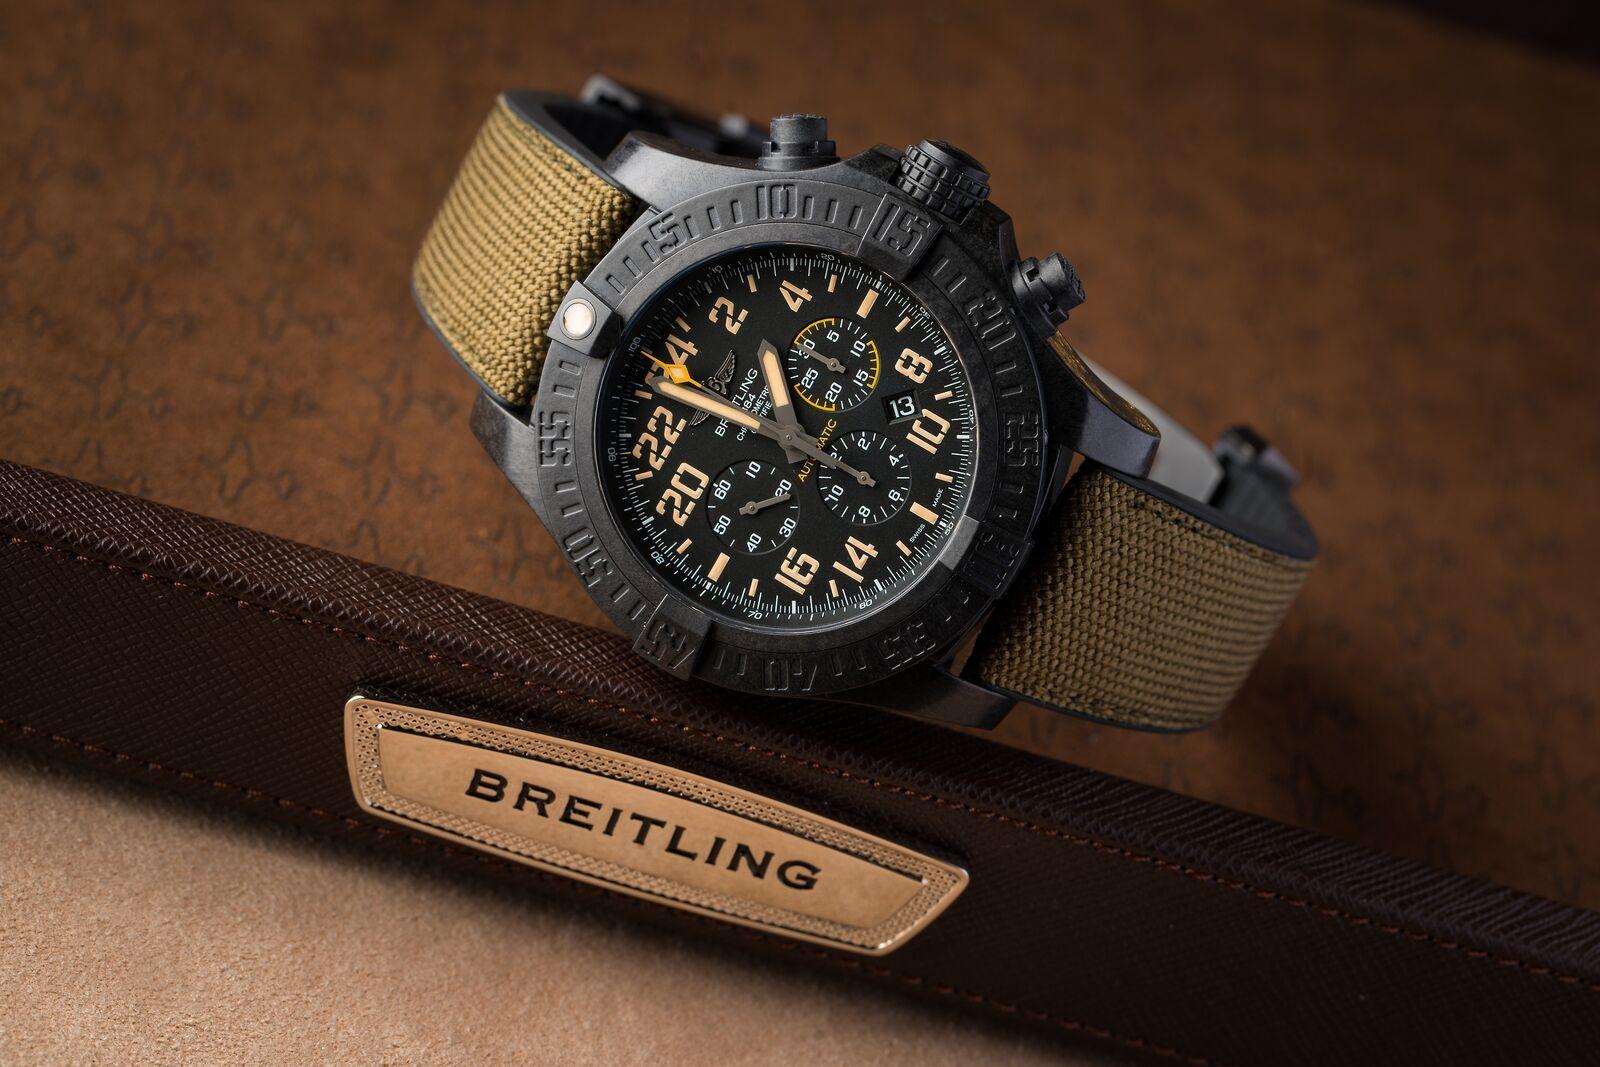 Bildergebnis Für Breitling Avenger Hurricane Breitling Uhren Hurricane